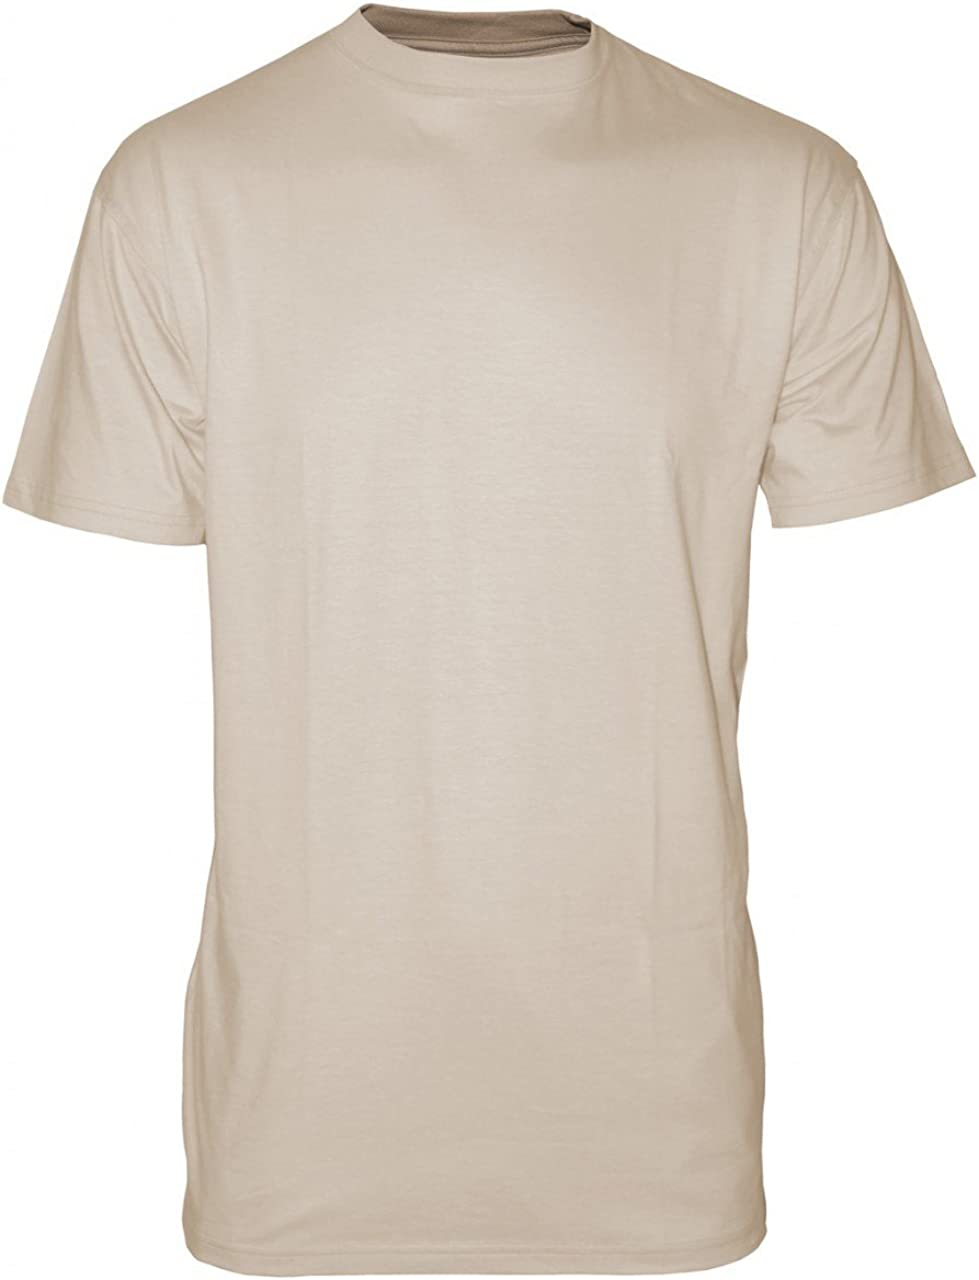 /'Art Supplies/' Men/'s Women/'s Cotton T-Shirts TA026154